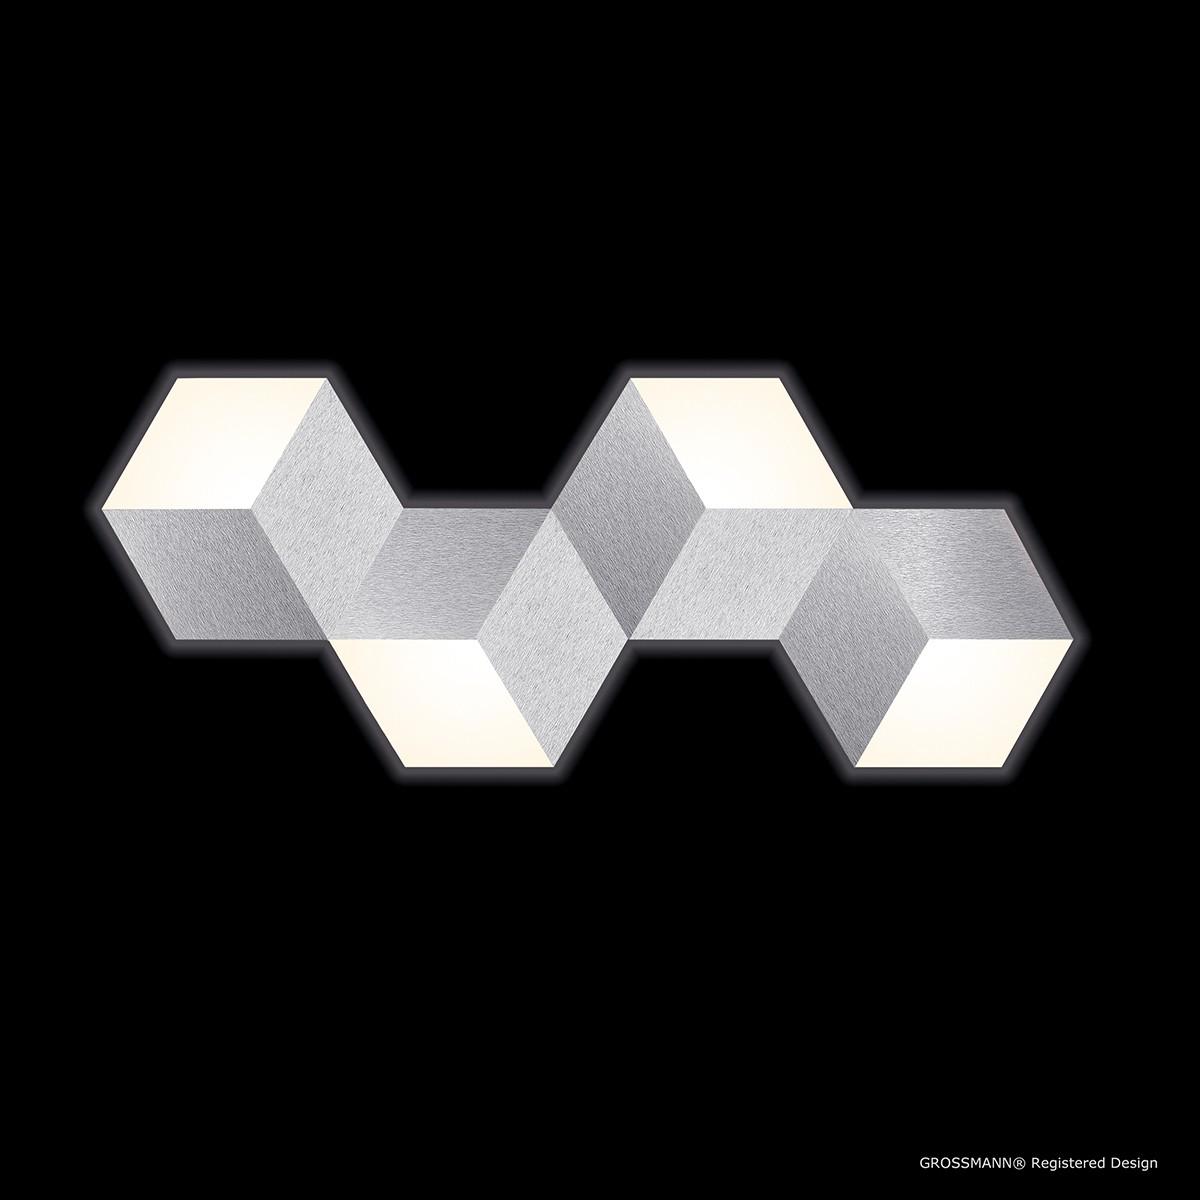 Grossmann Geo LED Wand- / Deckenleuchte, 4-flg., Aluminium gebürstet